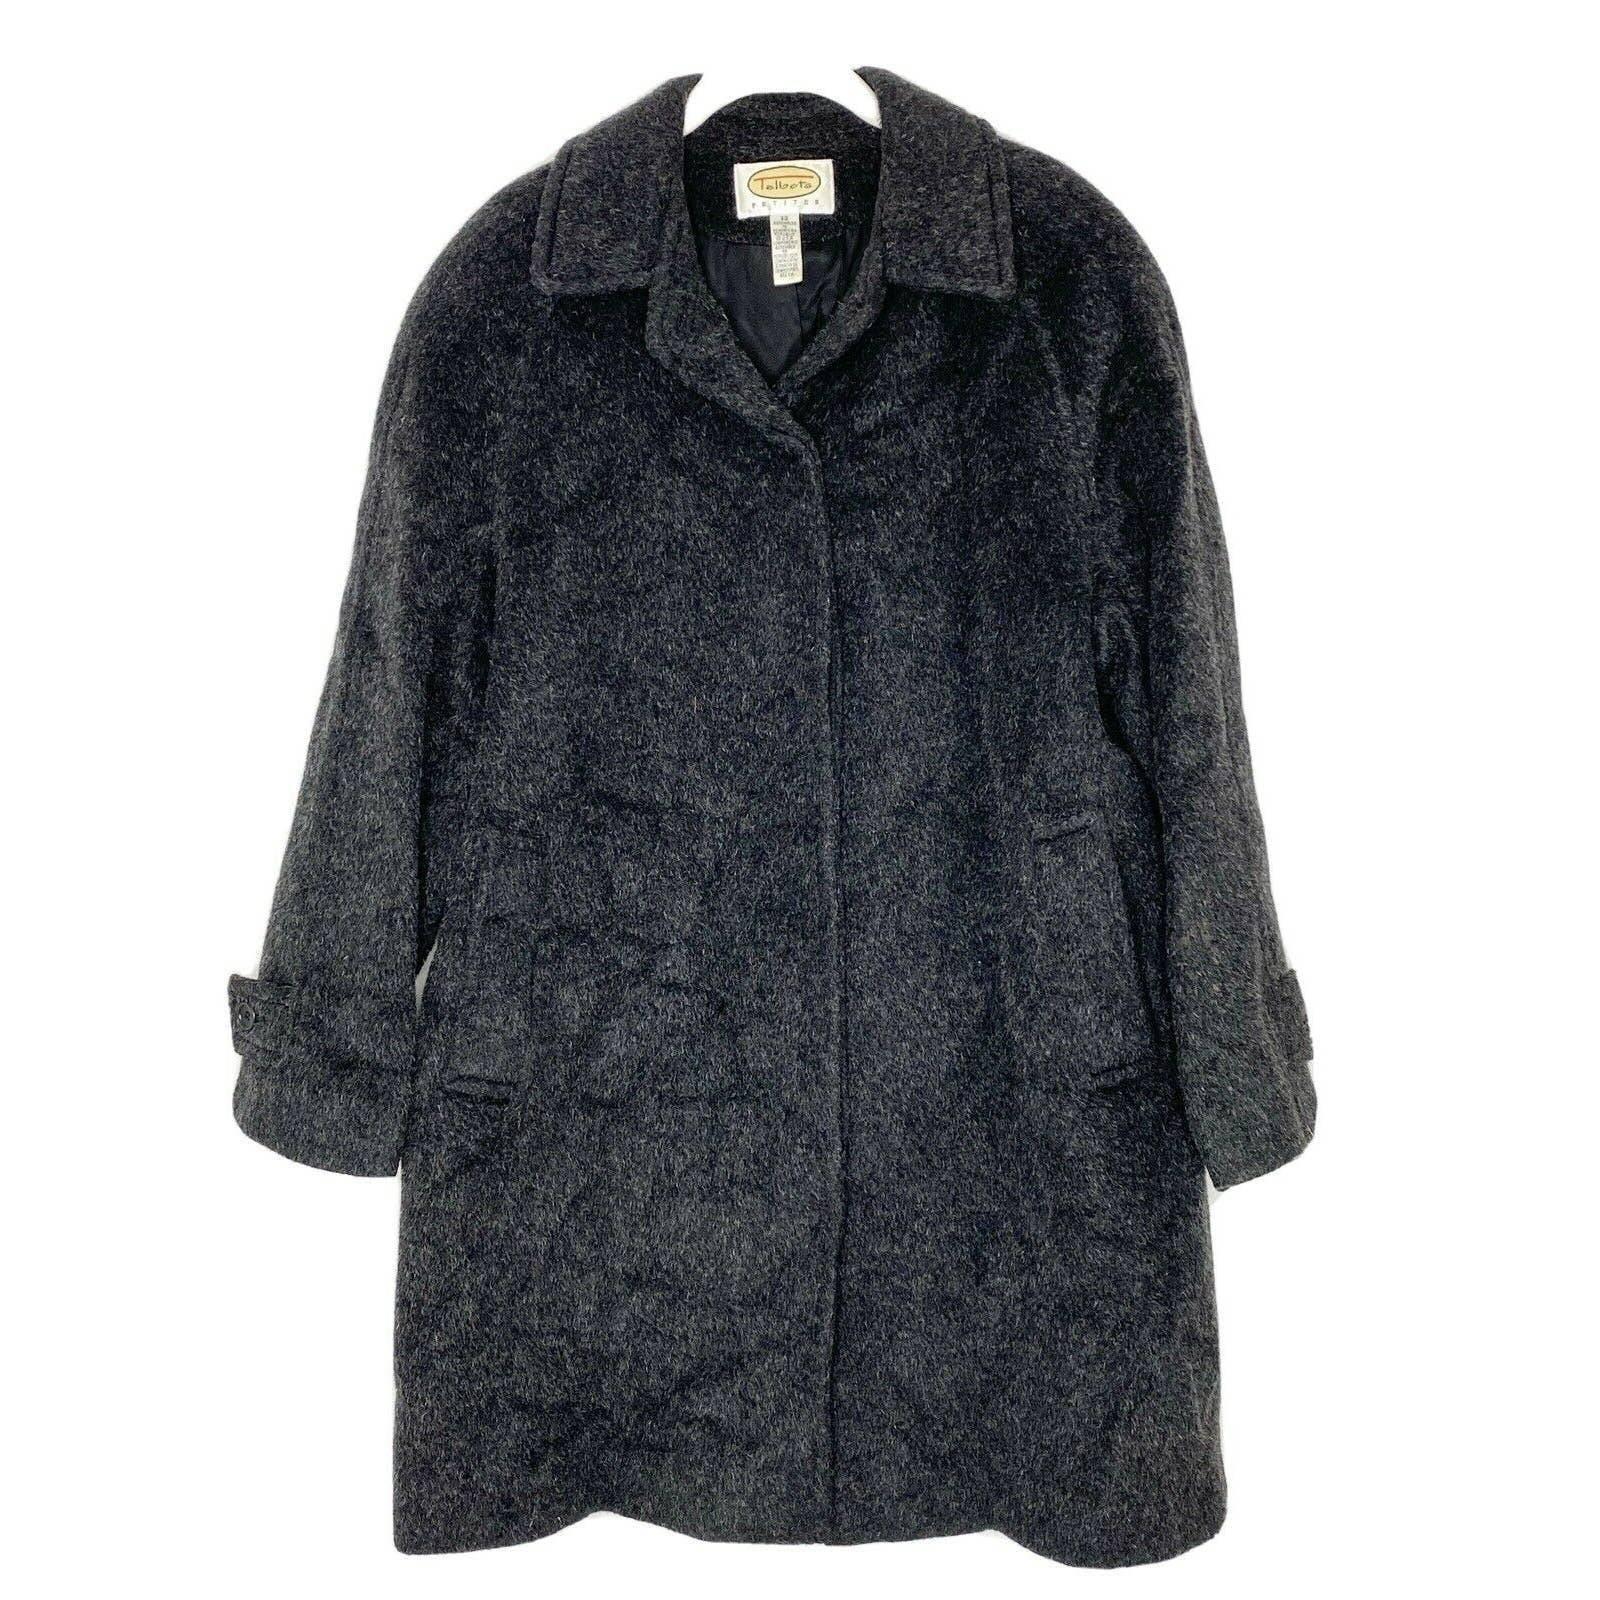 Talbots Wool Mohair Jacket Pea Coat